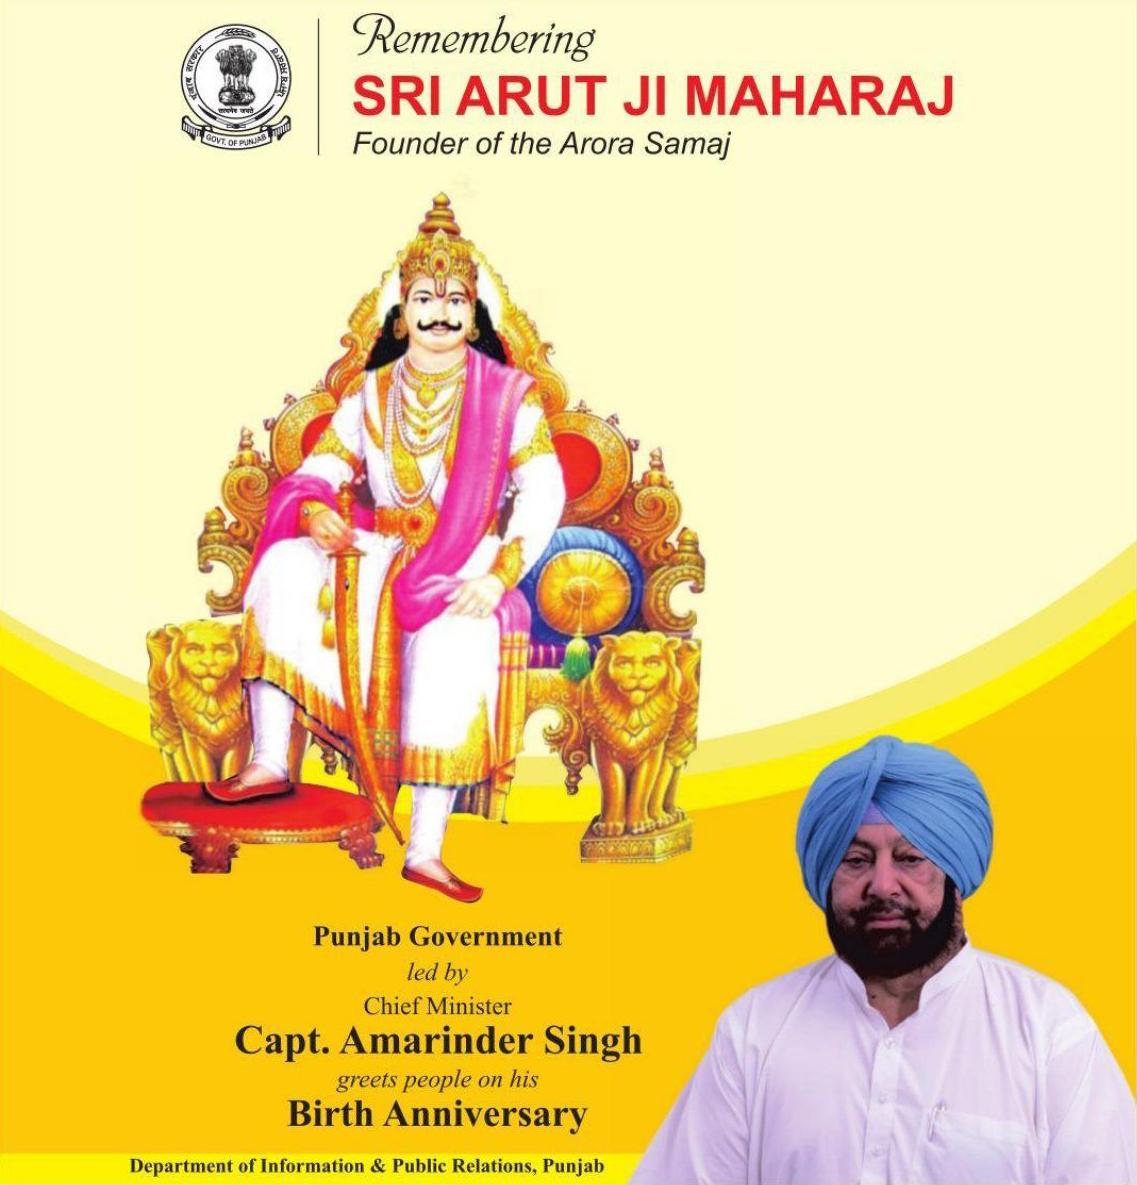 remembering-sri-arut-ji-maharaj-founder-of-the-arora-samaj-ad-tribune-chandigarh-30-5-2021